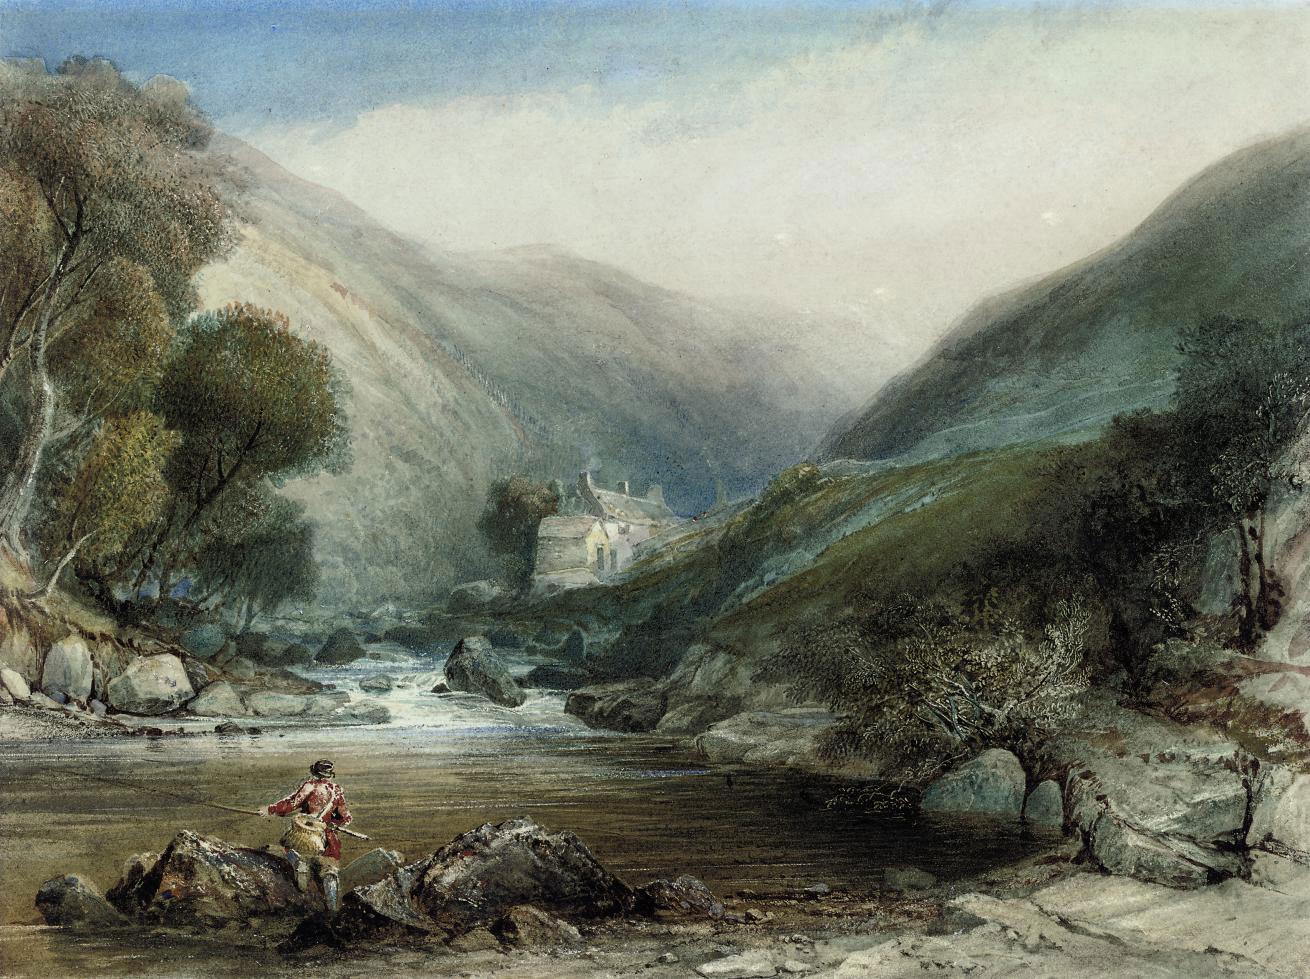 Samuel Jackson, A.O.W.S. (1794-1869)